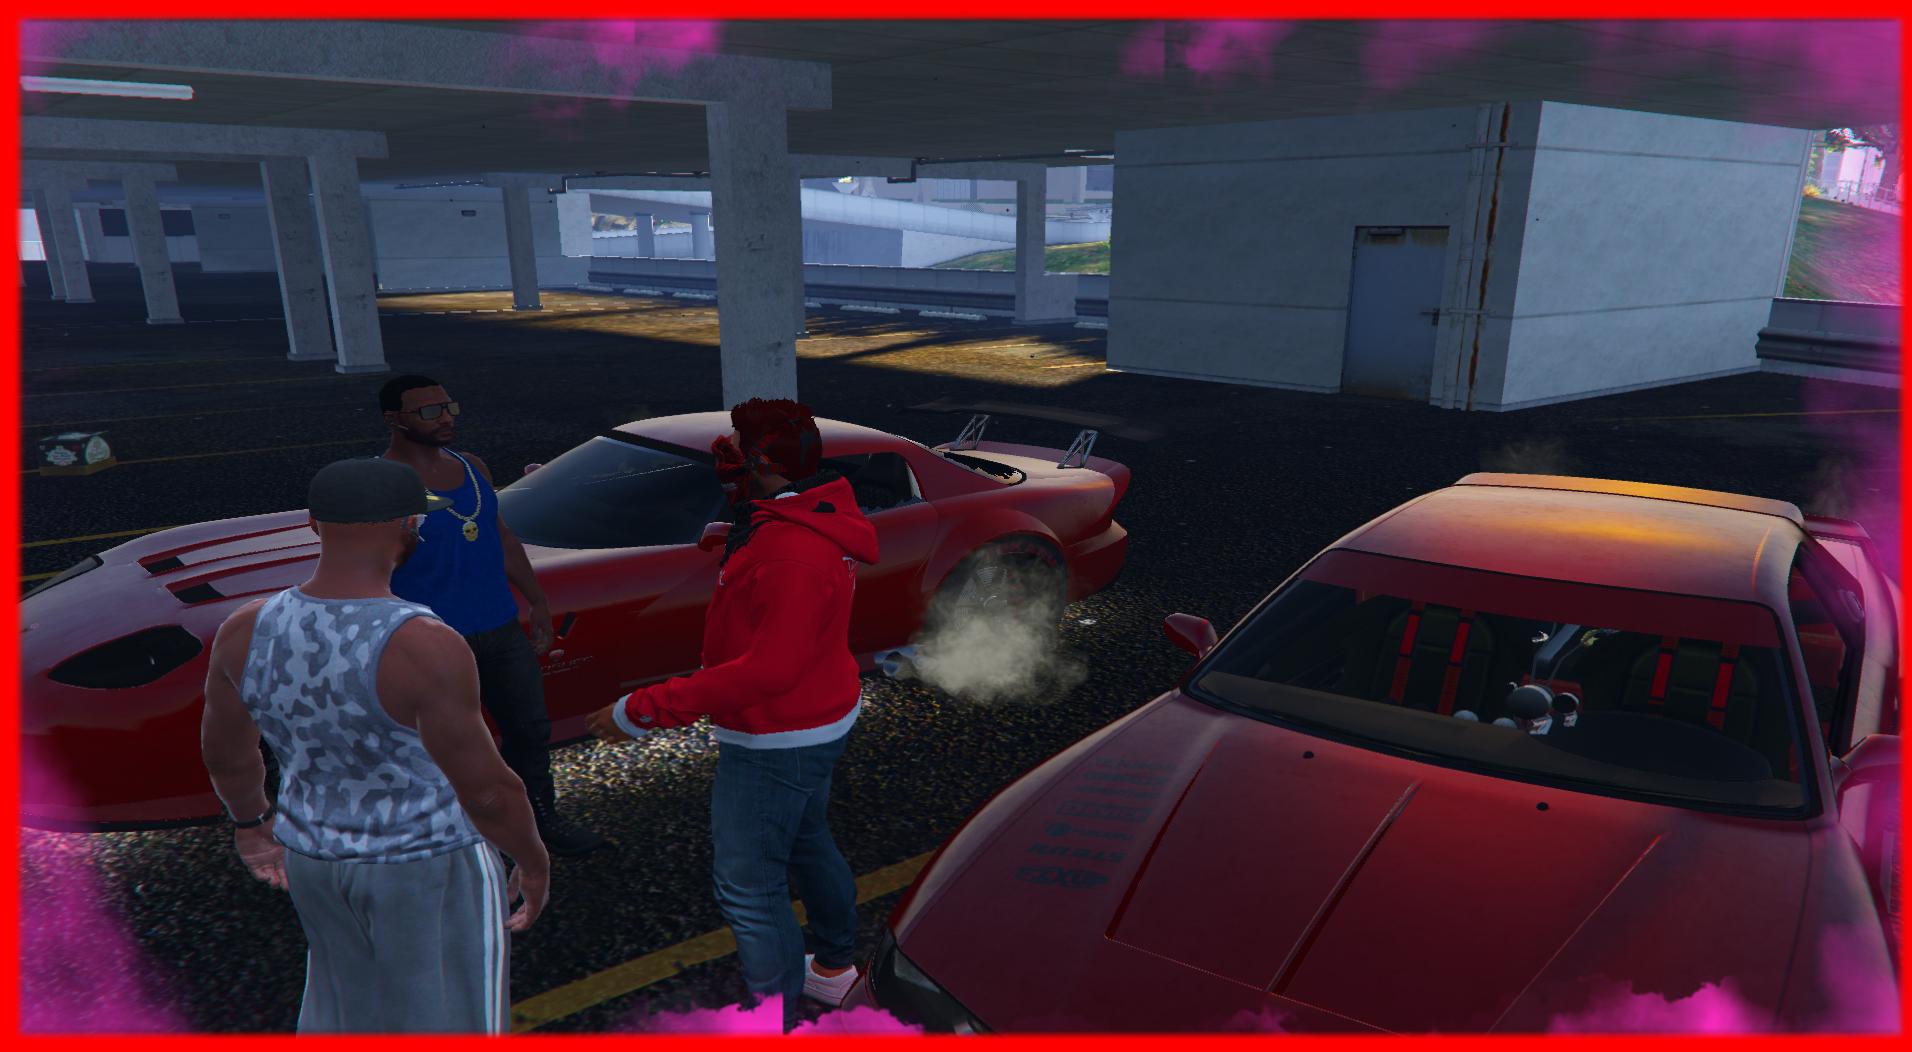 Grand_Theft_Auto_V_Screenshot_2021.02.27_-_21.24.jpg